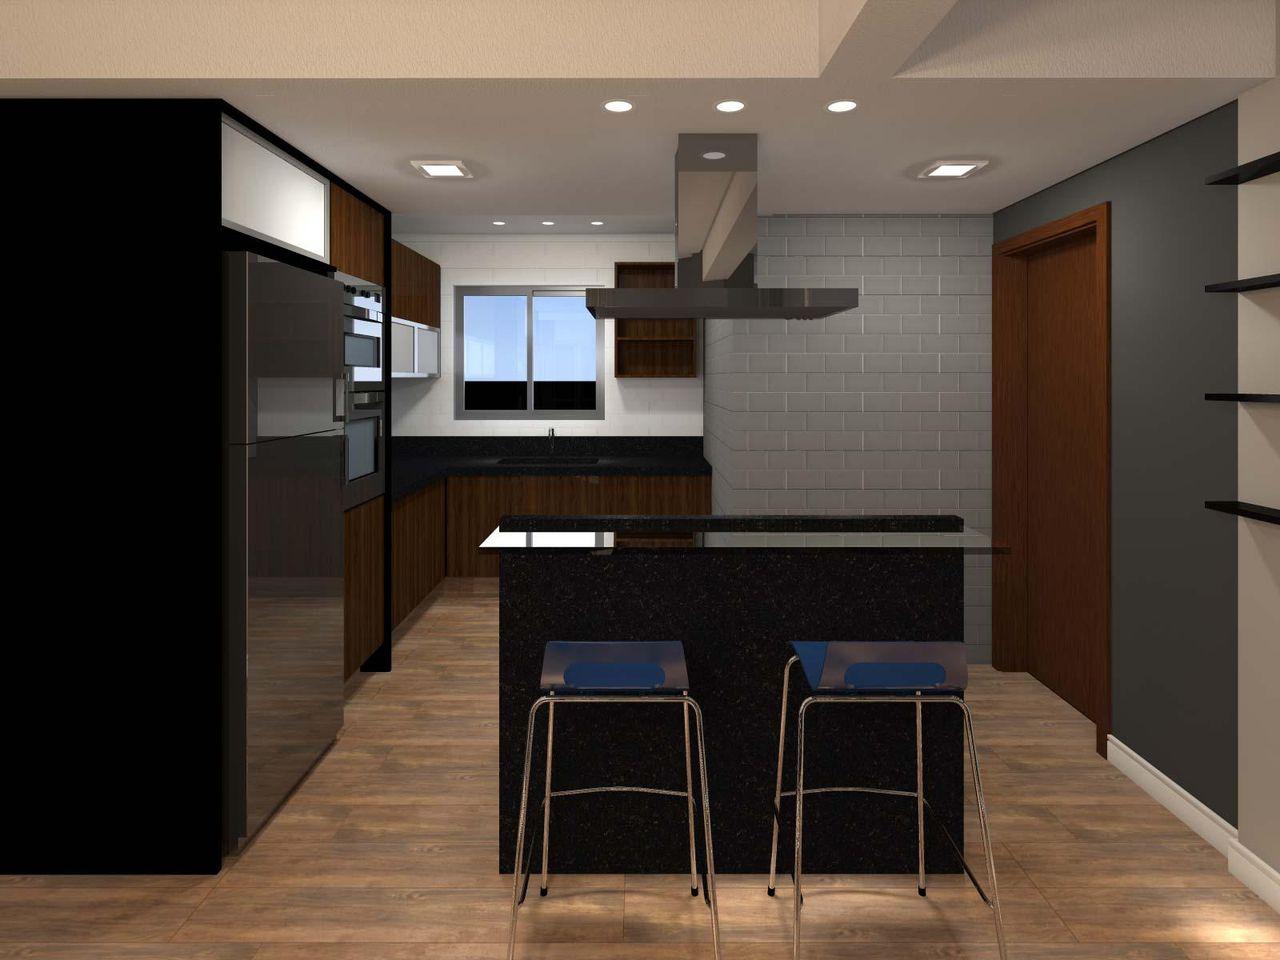 Cozinha Americana Com Bancada De Granito Escuro De Juliana Lahoz